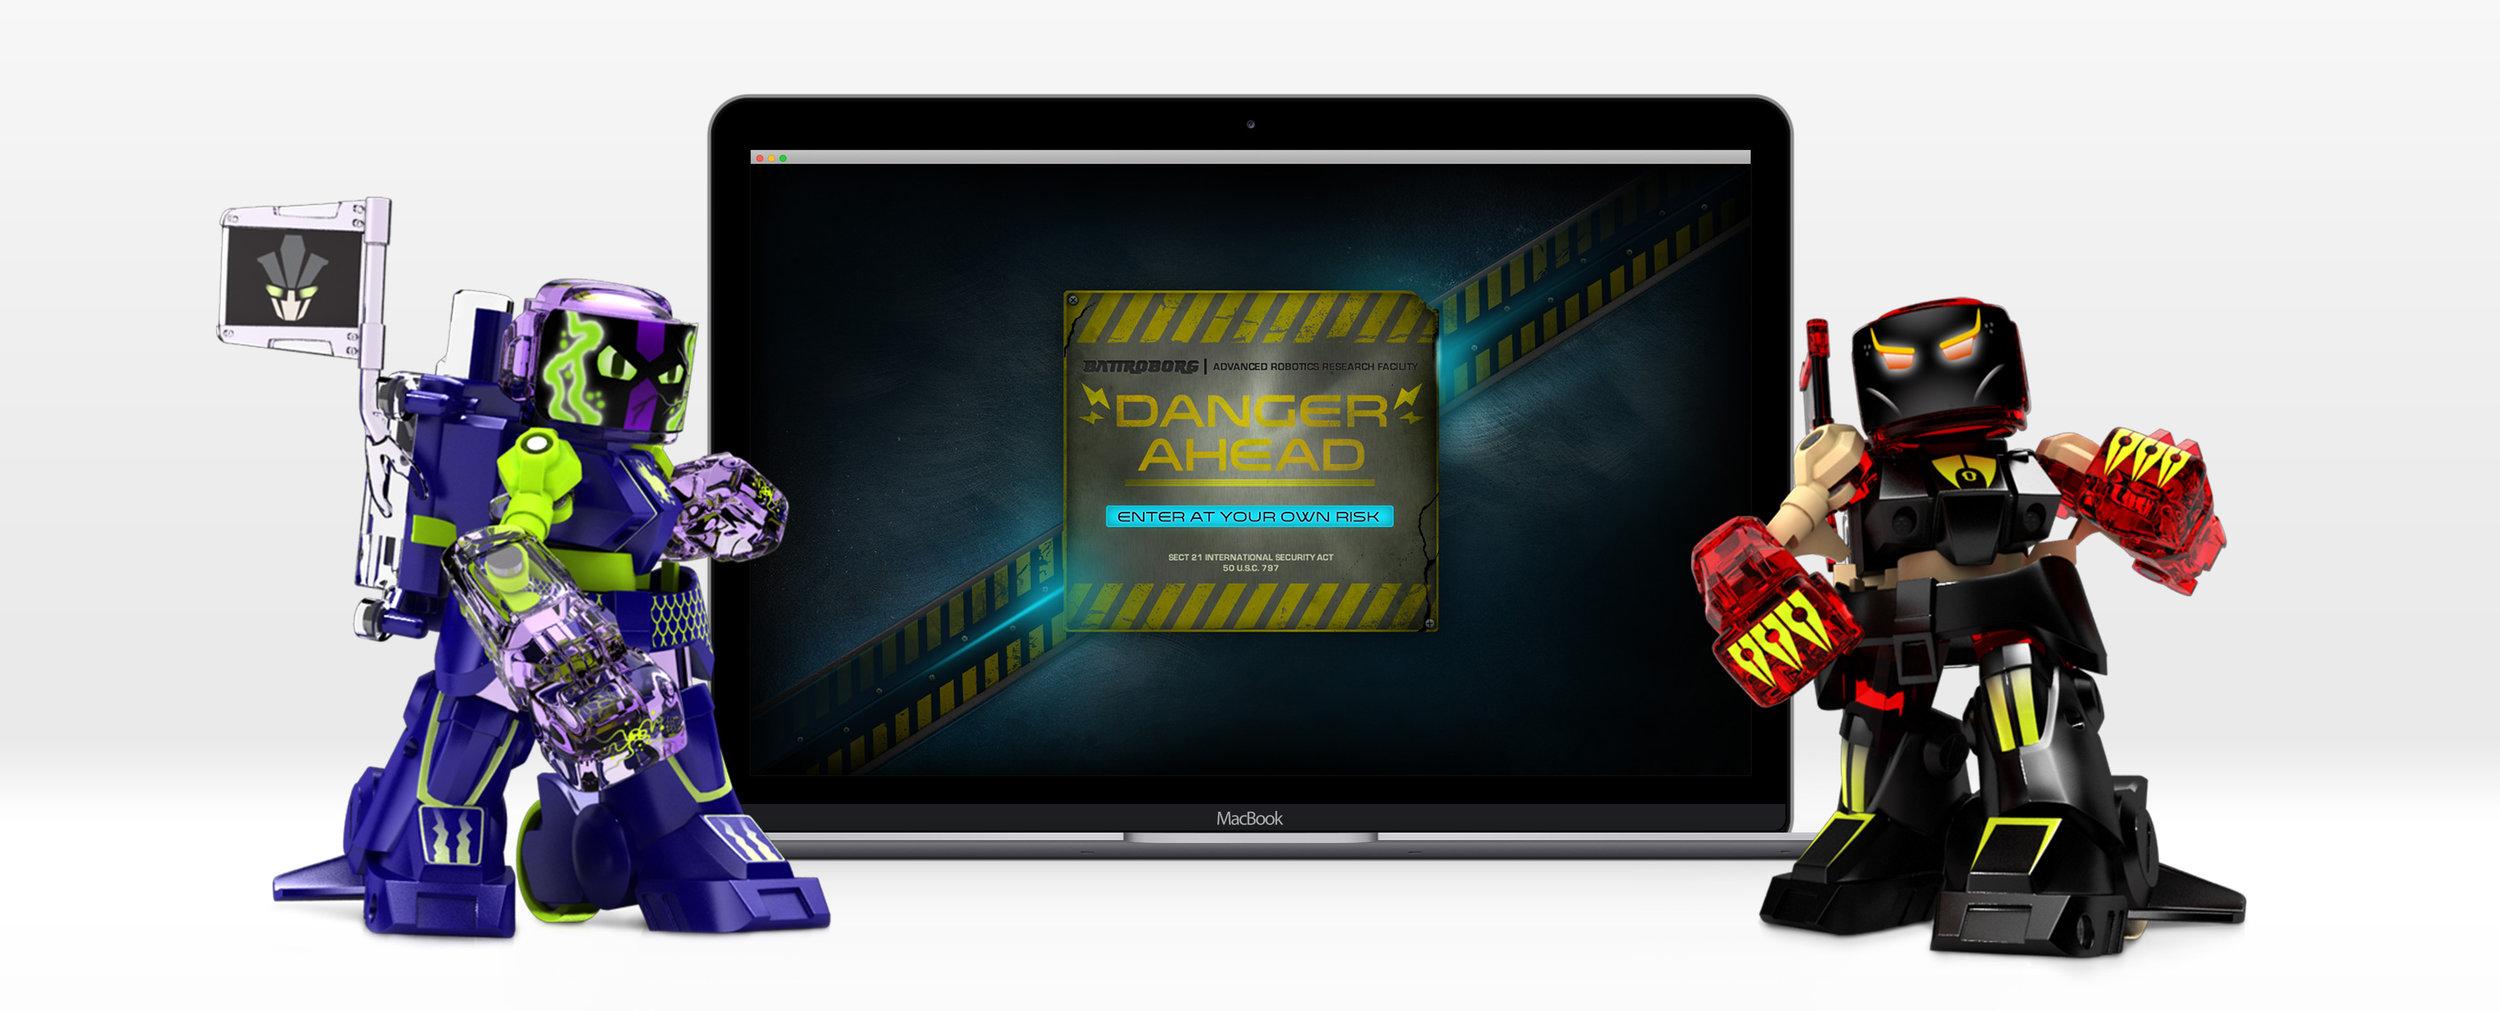 MacbookMockup.jpg